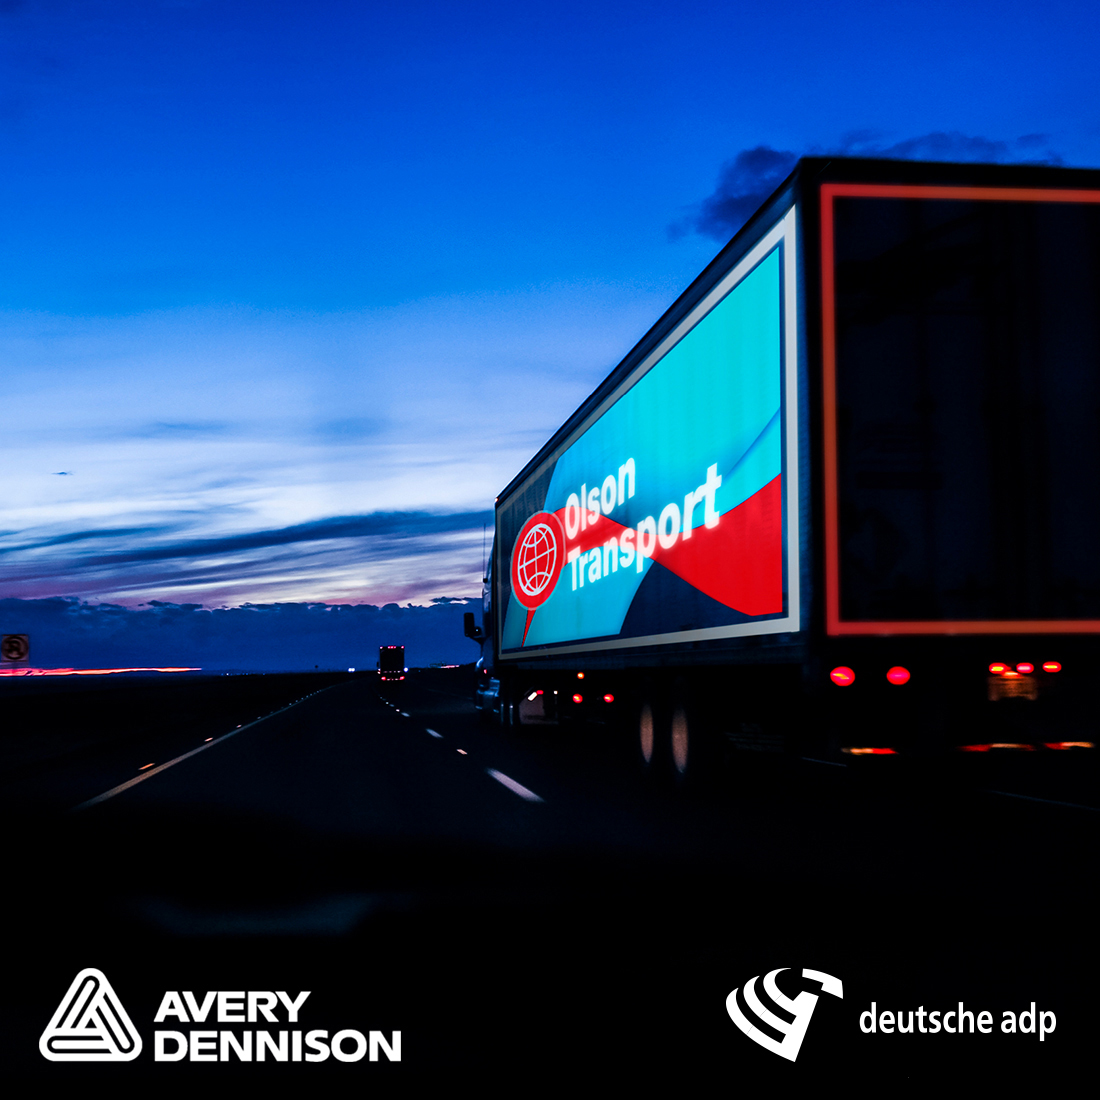 Avery Dennison V-6750 Konturmarkierung